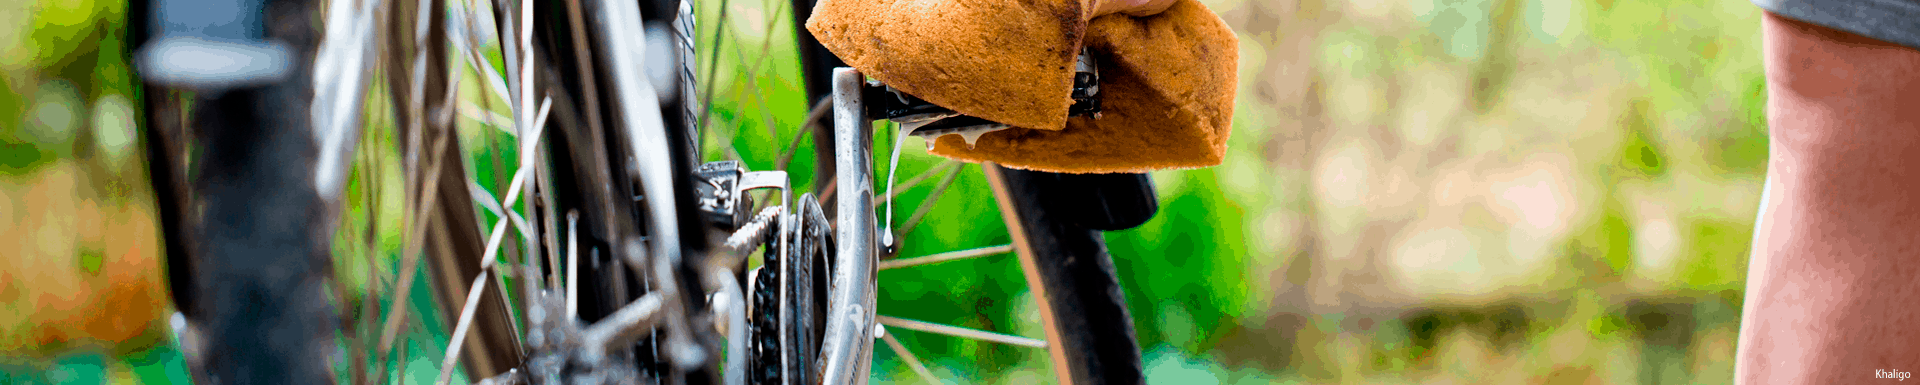 Lavar bicicleta WD-40 BIKE